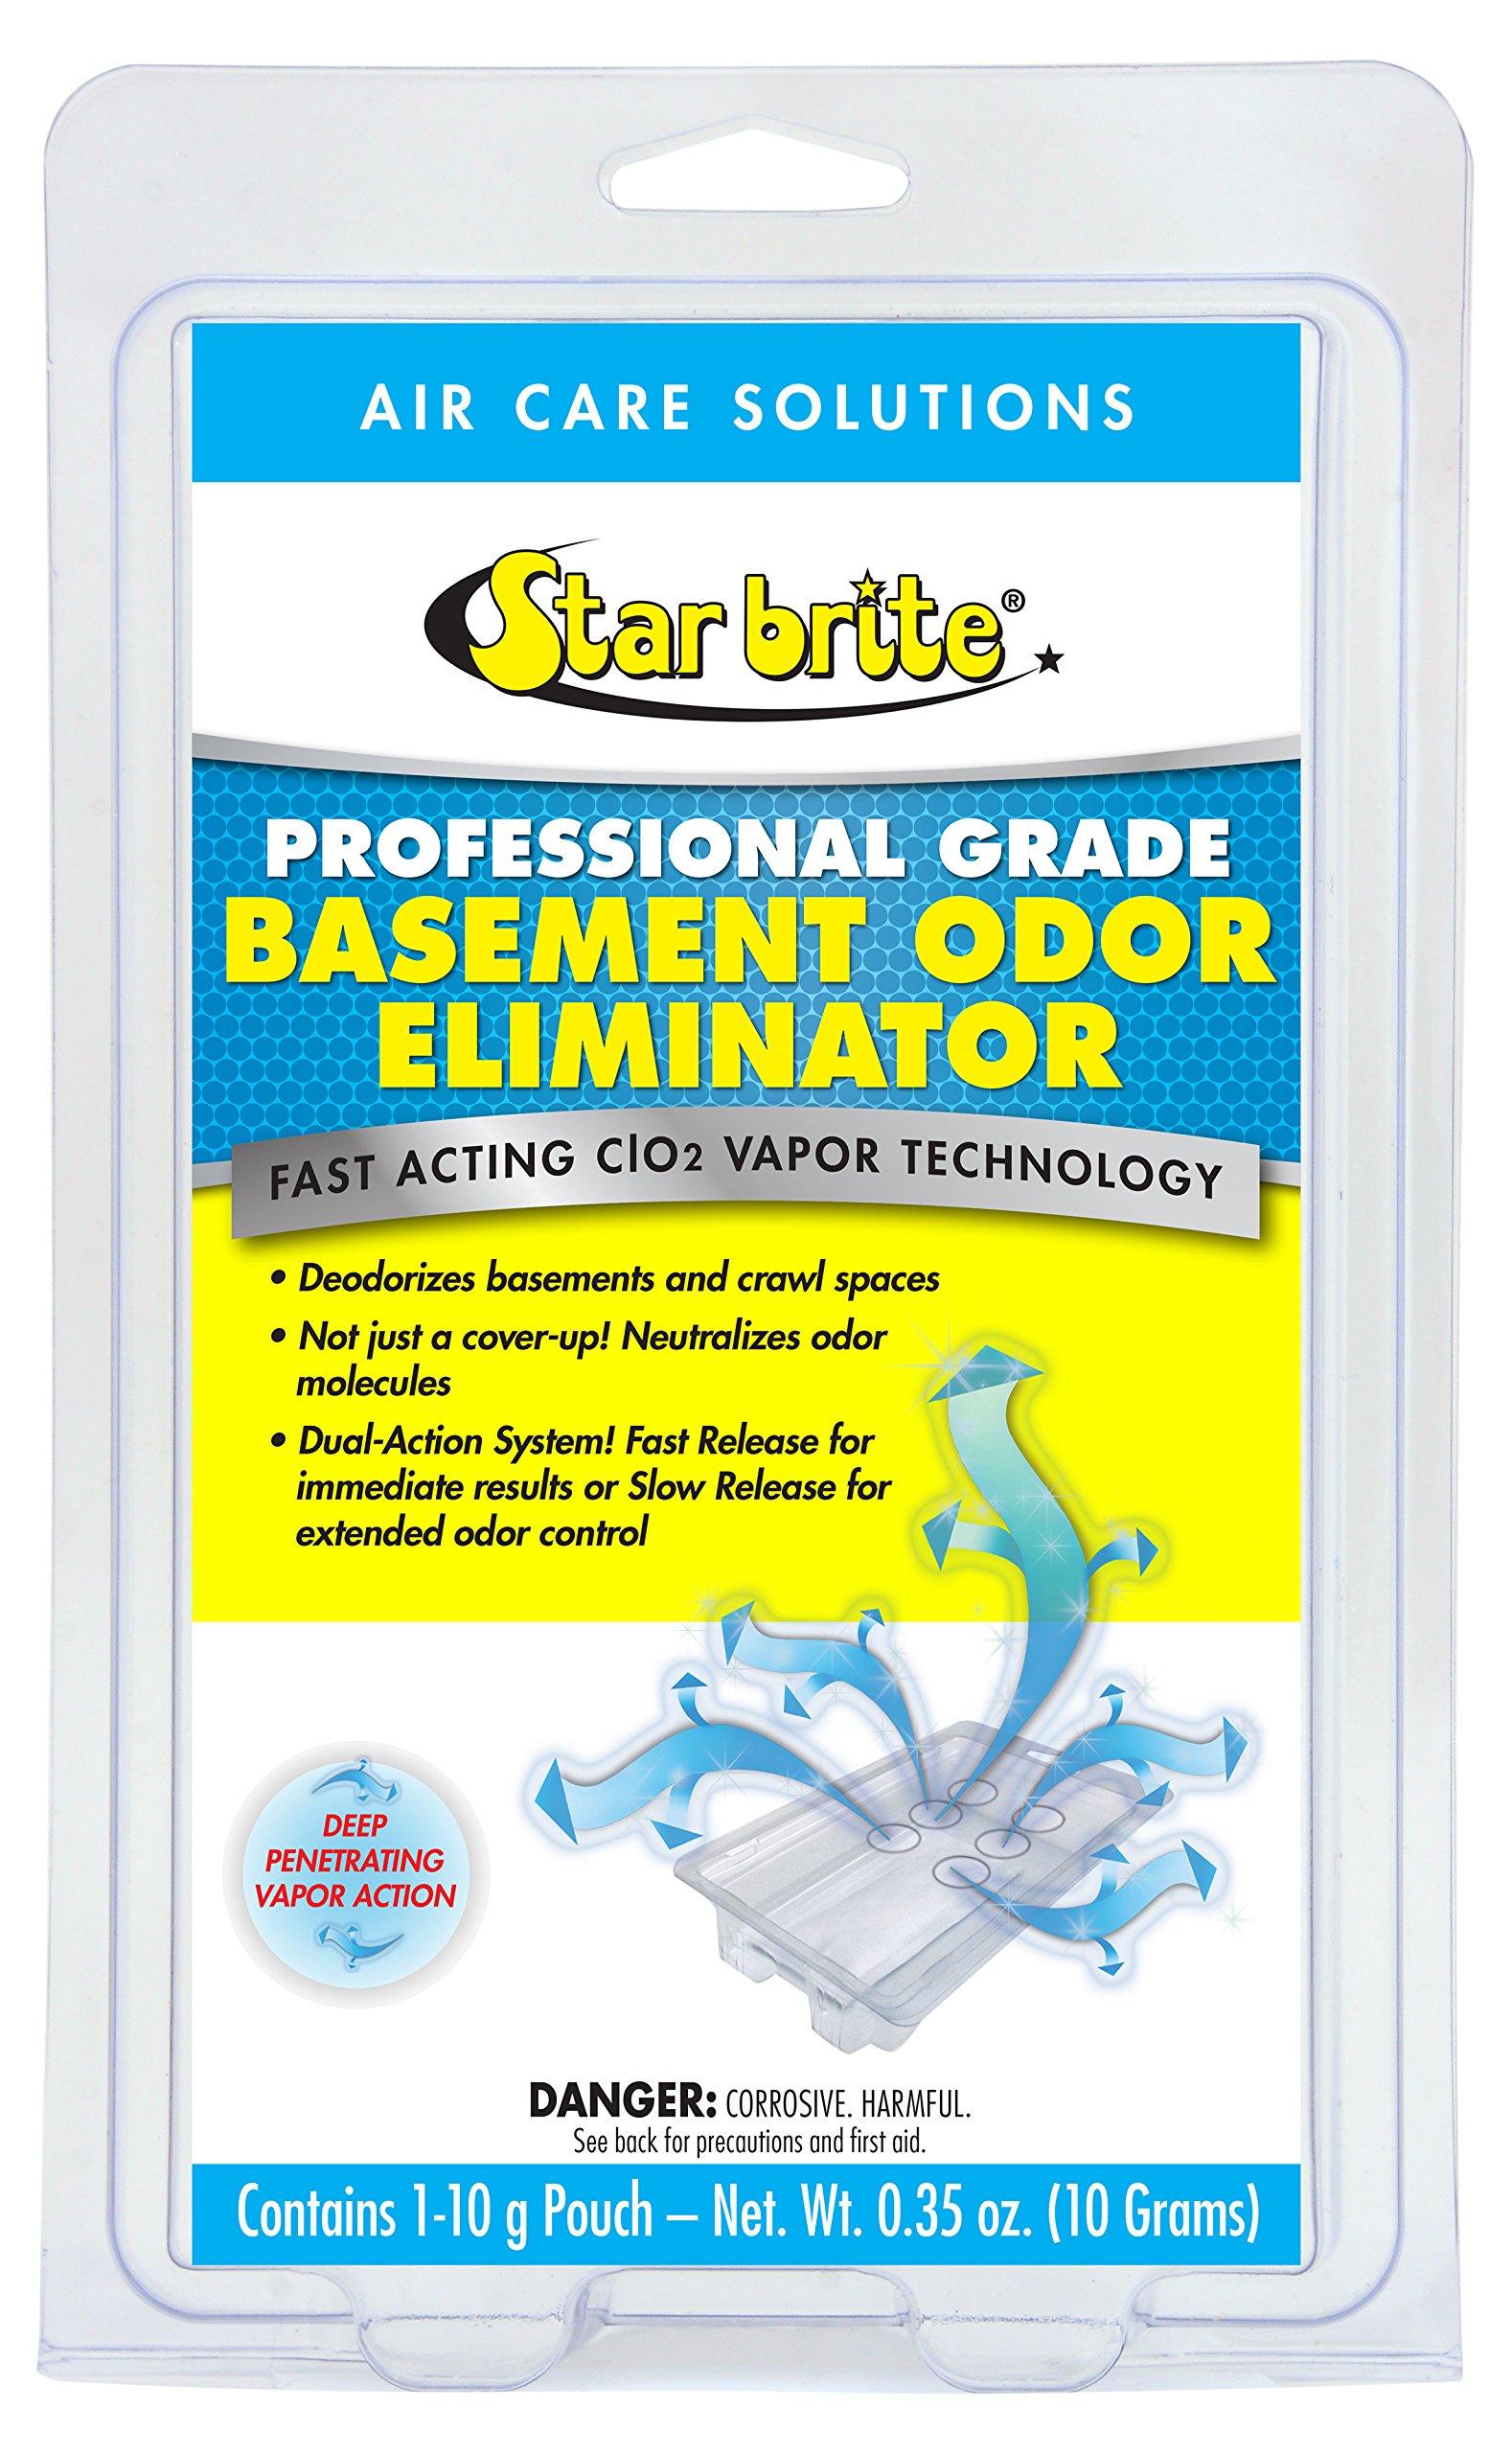 Star brite Basement Odor Eliminator - Fast Acting Vapor Technolgy